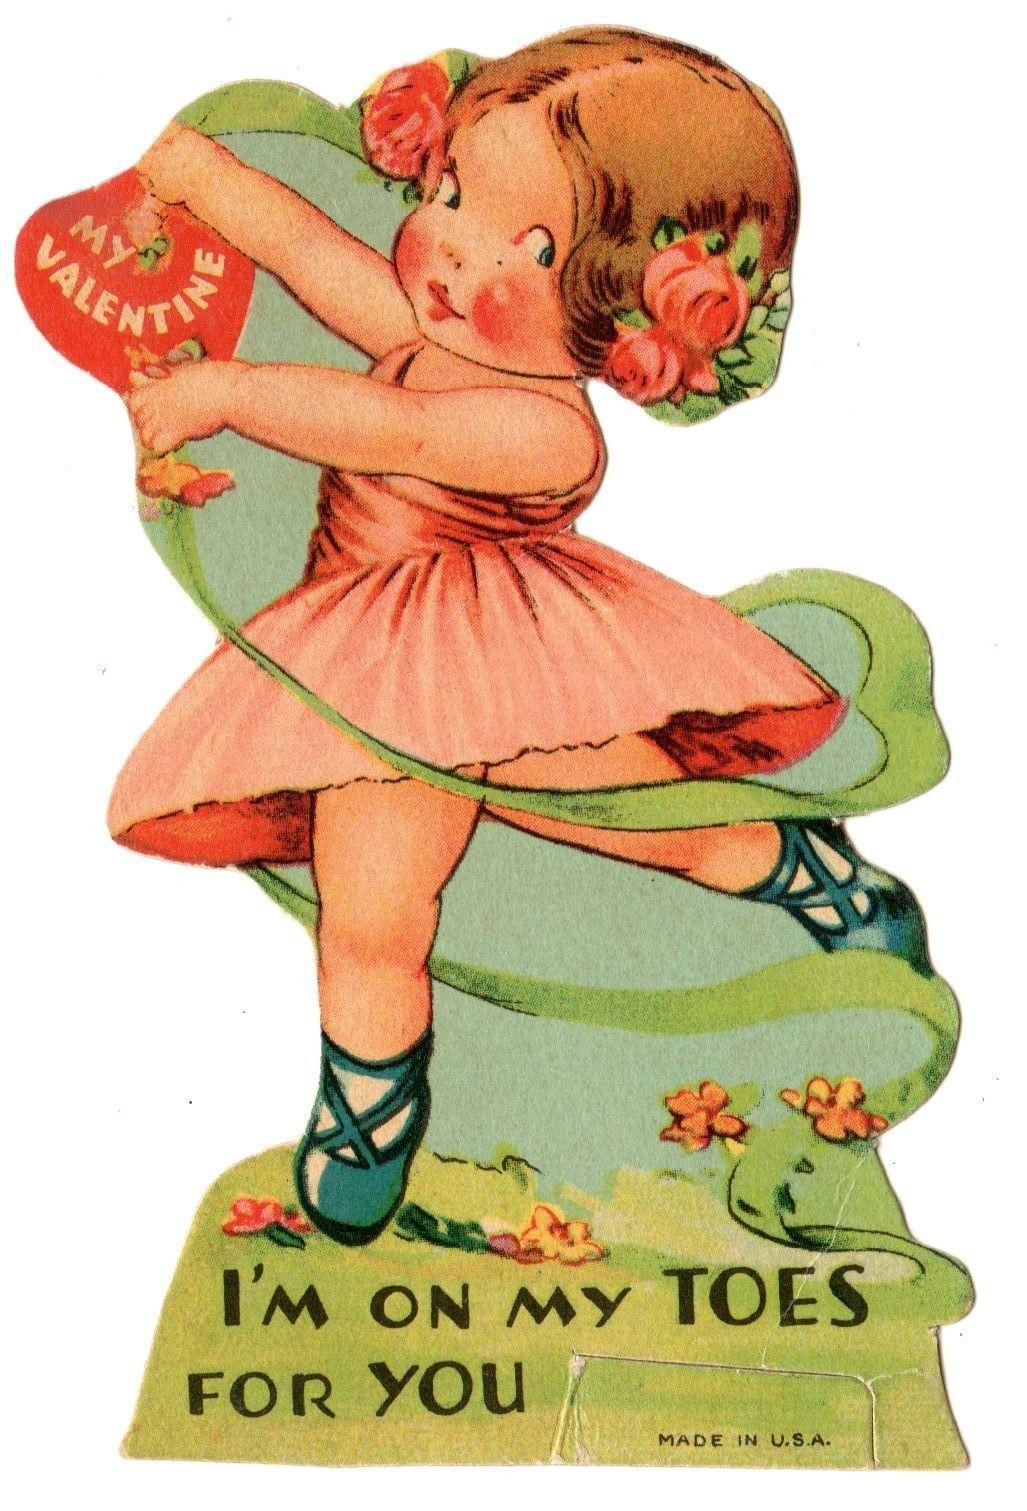 Ballerina Ballet Dancer Says IM on My Toes for You  Vintage